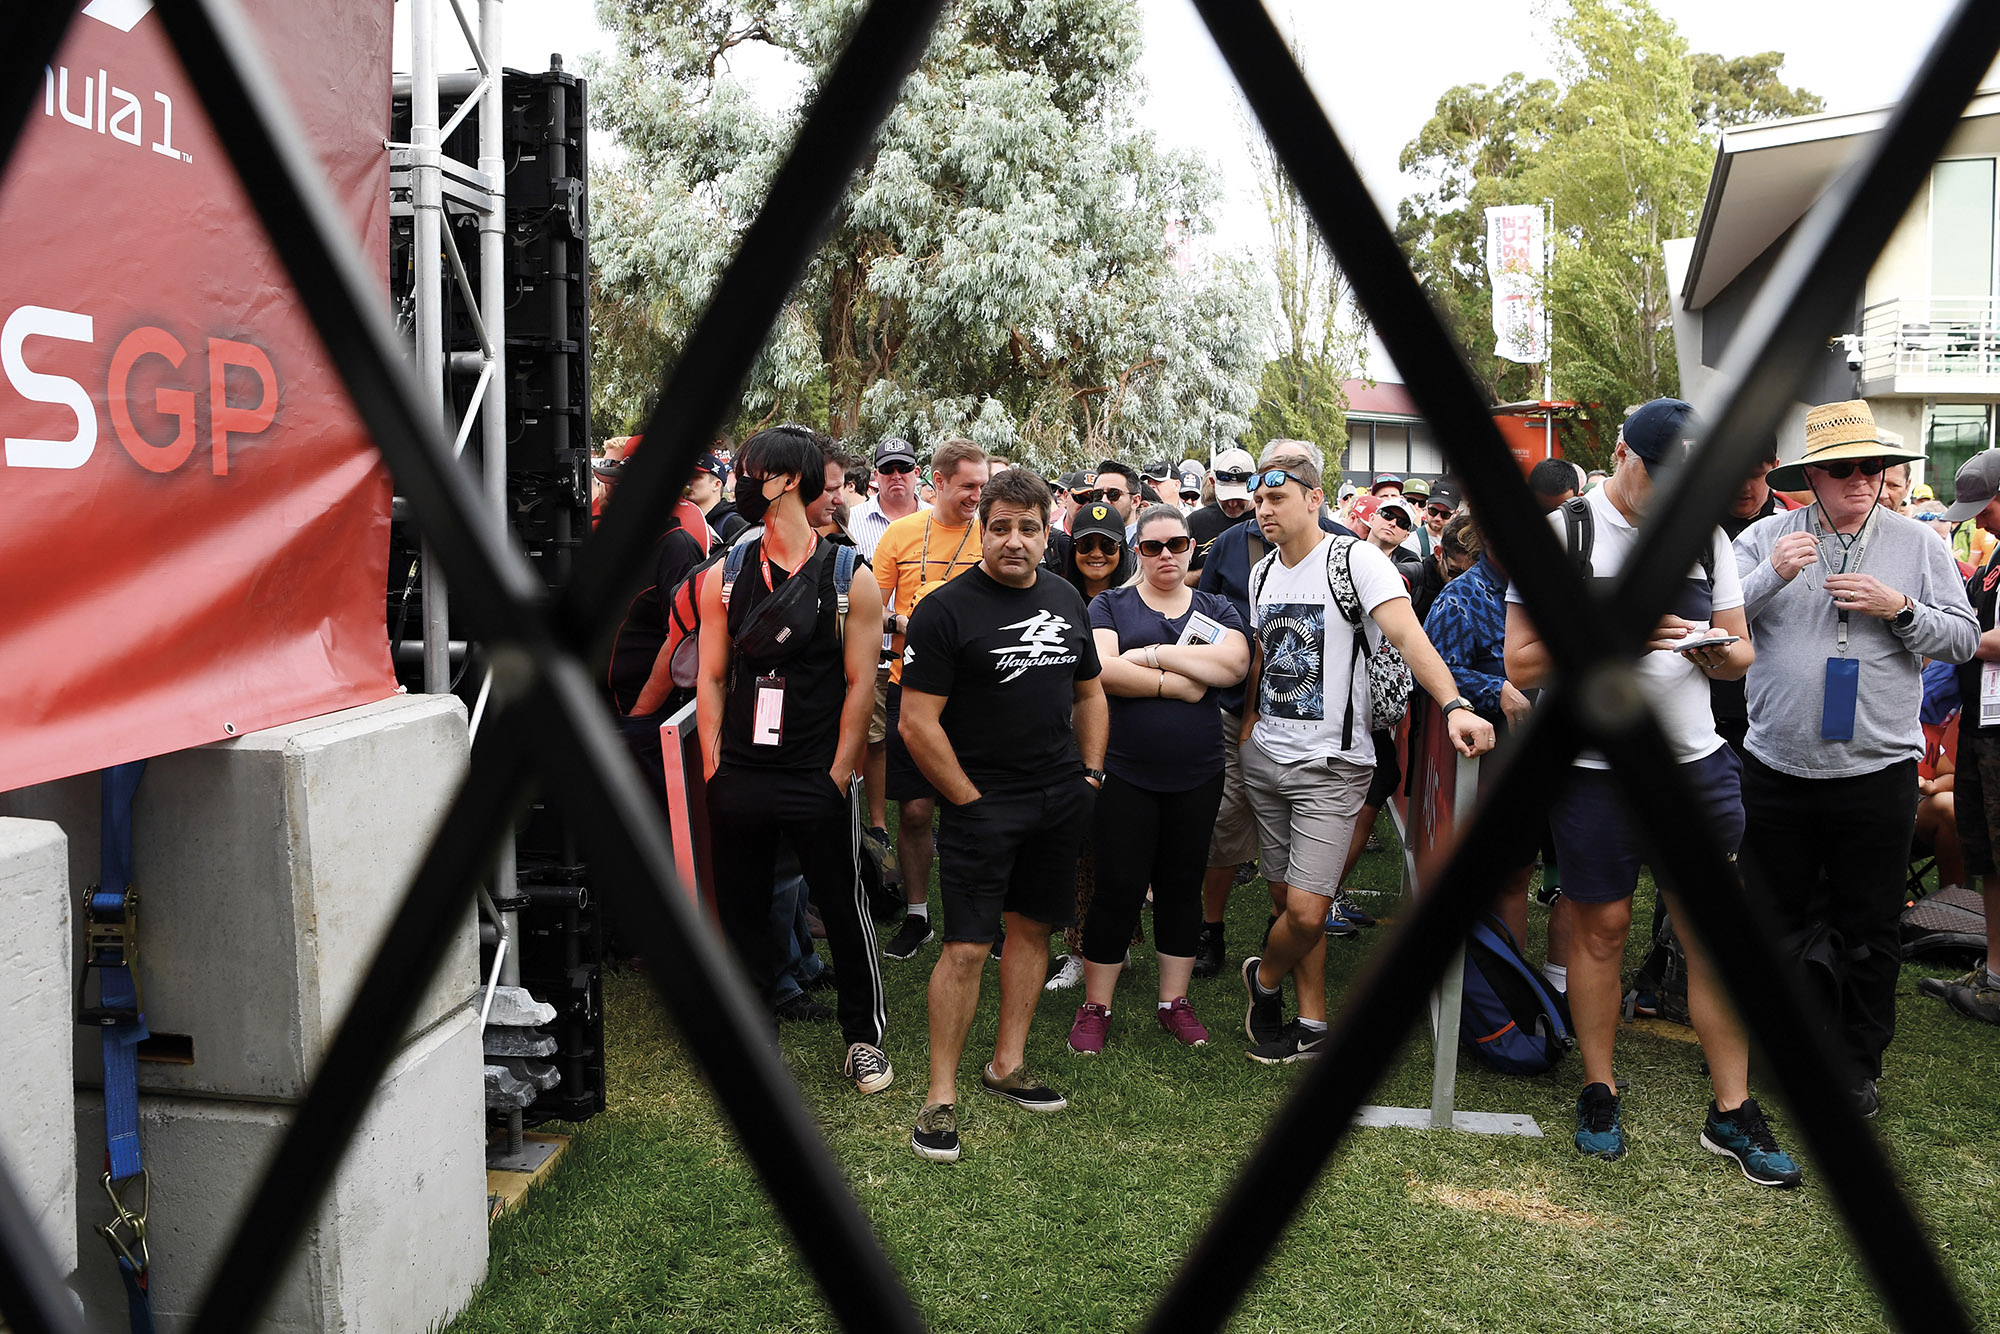 Australian GP 2020 crowds